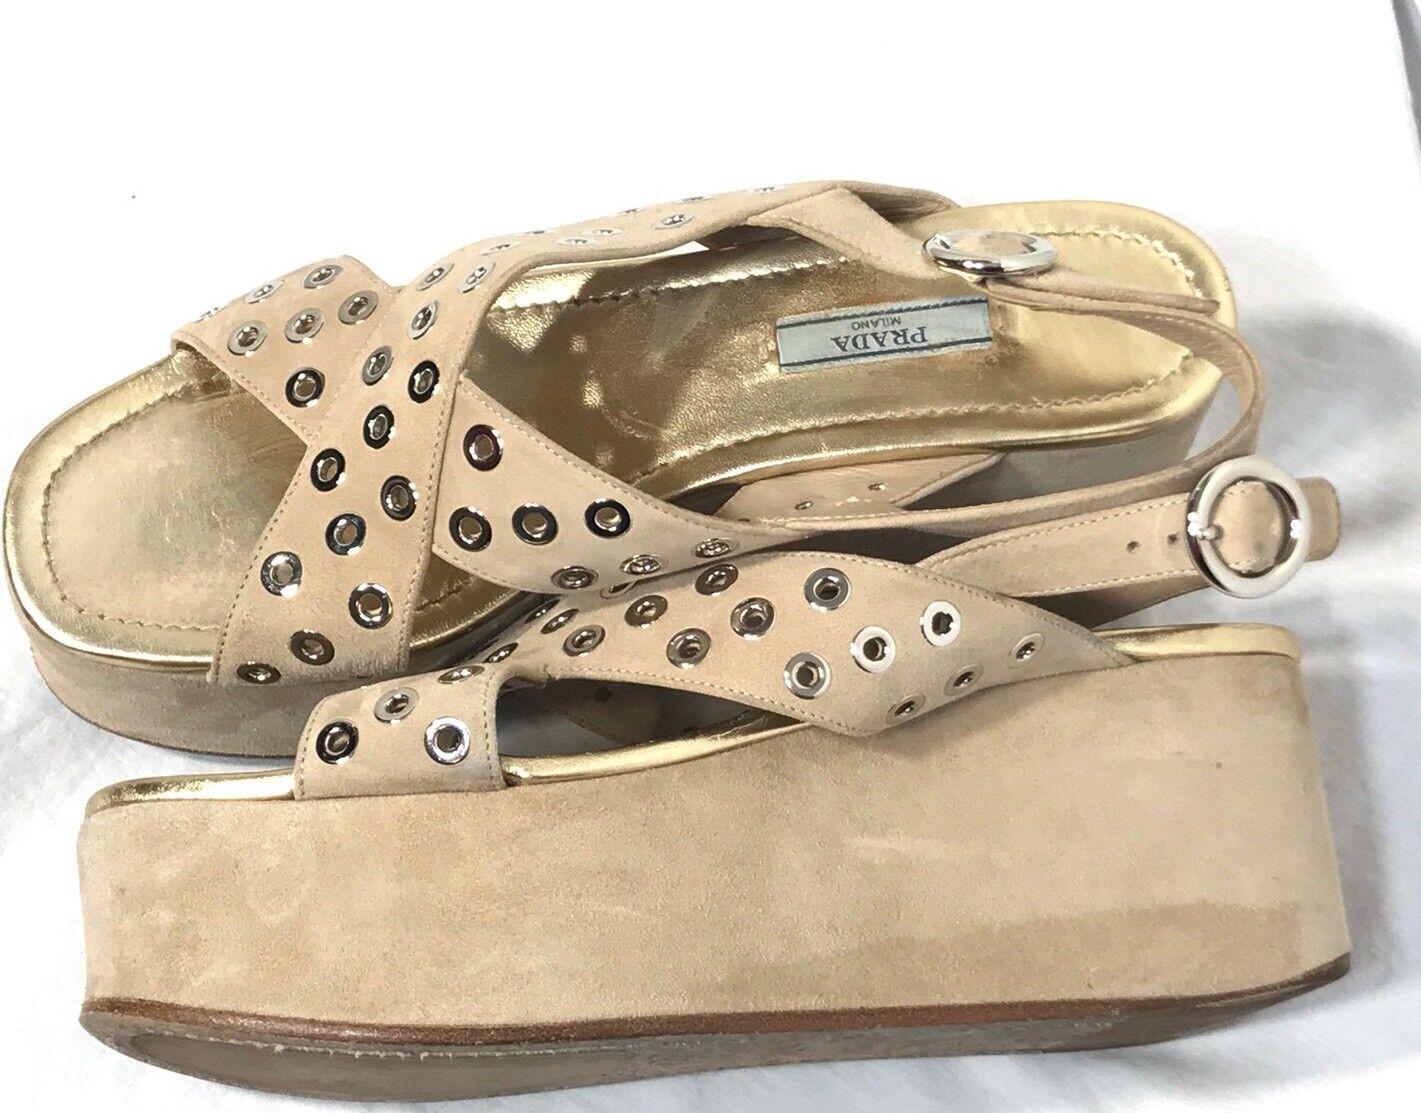 Plataforma De Gamuza Para Mujer talla PRADA puntera abierta sandalia talla Mujer 40 ec8f88